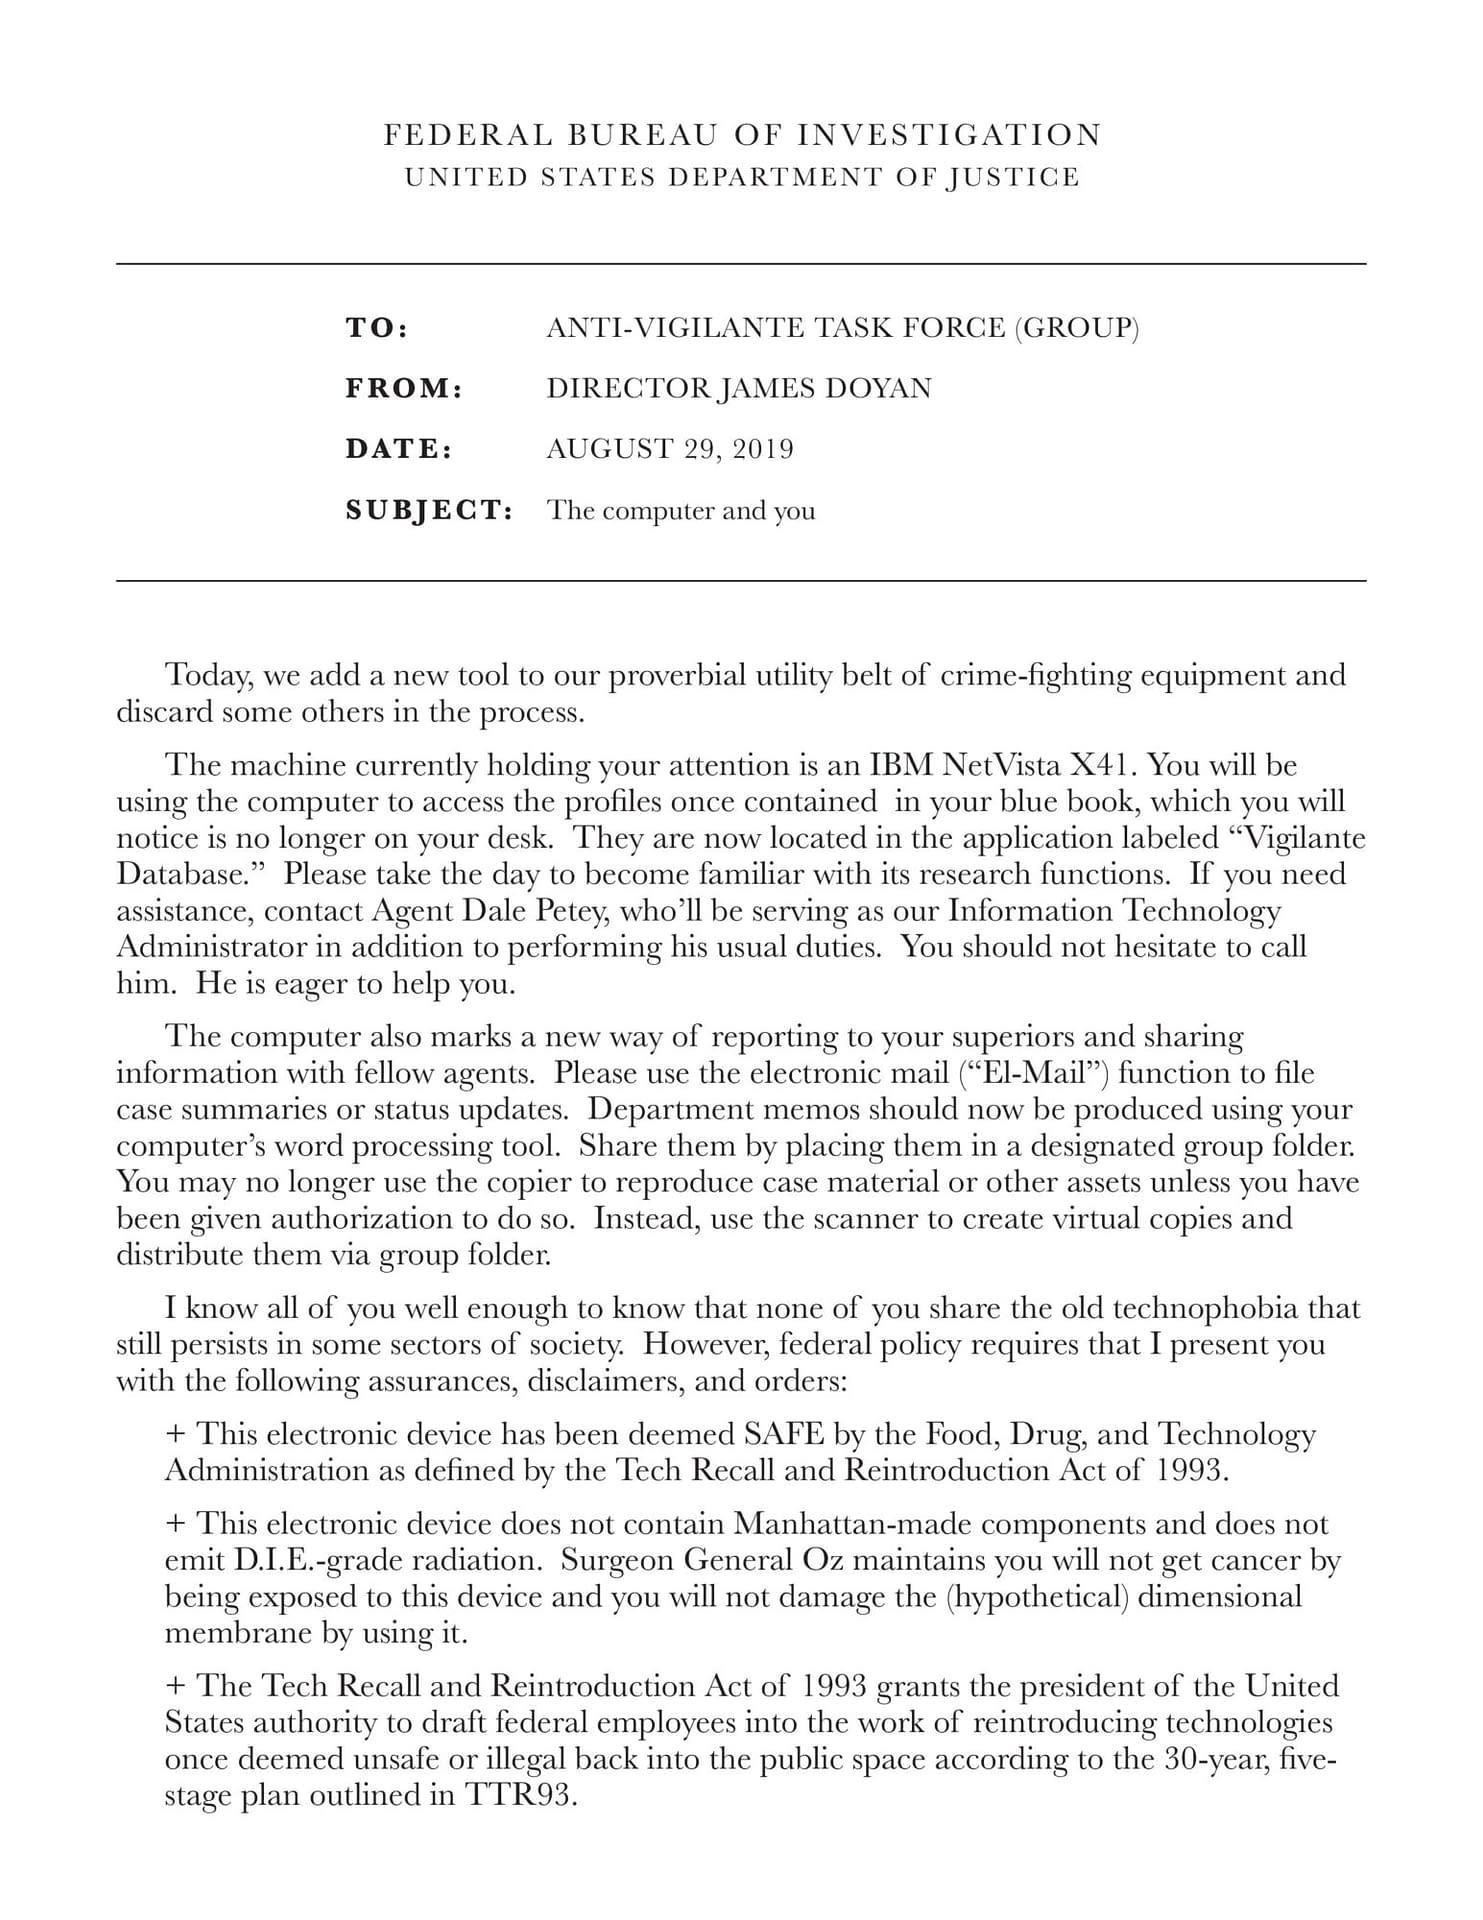 """Watchmen"": ""Peteypedia"" Files Offer New Info on Veidt's Fate, Rorschach's Journal & More"